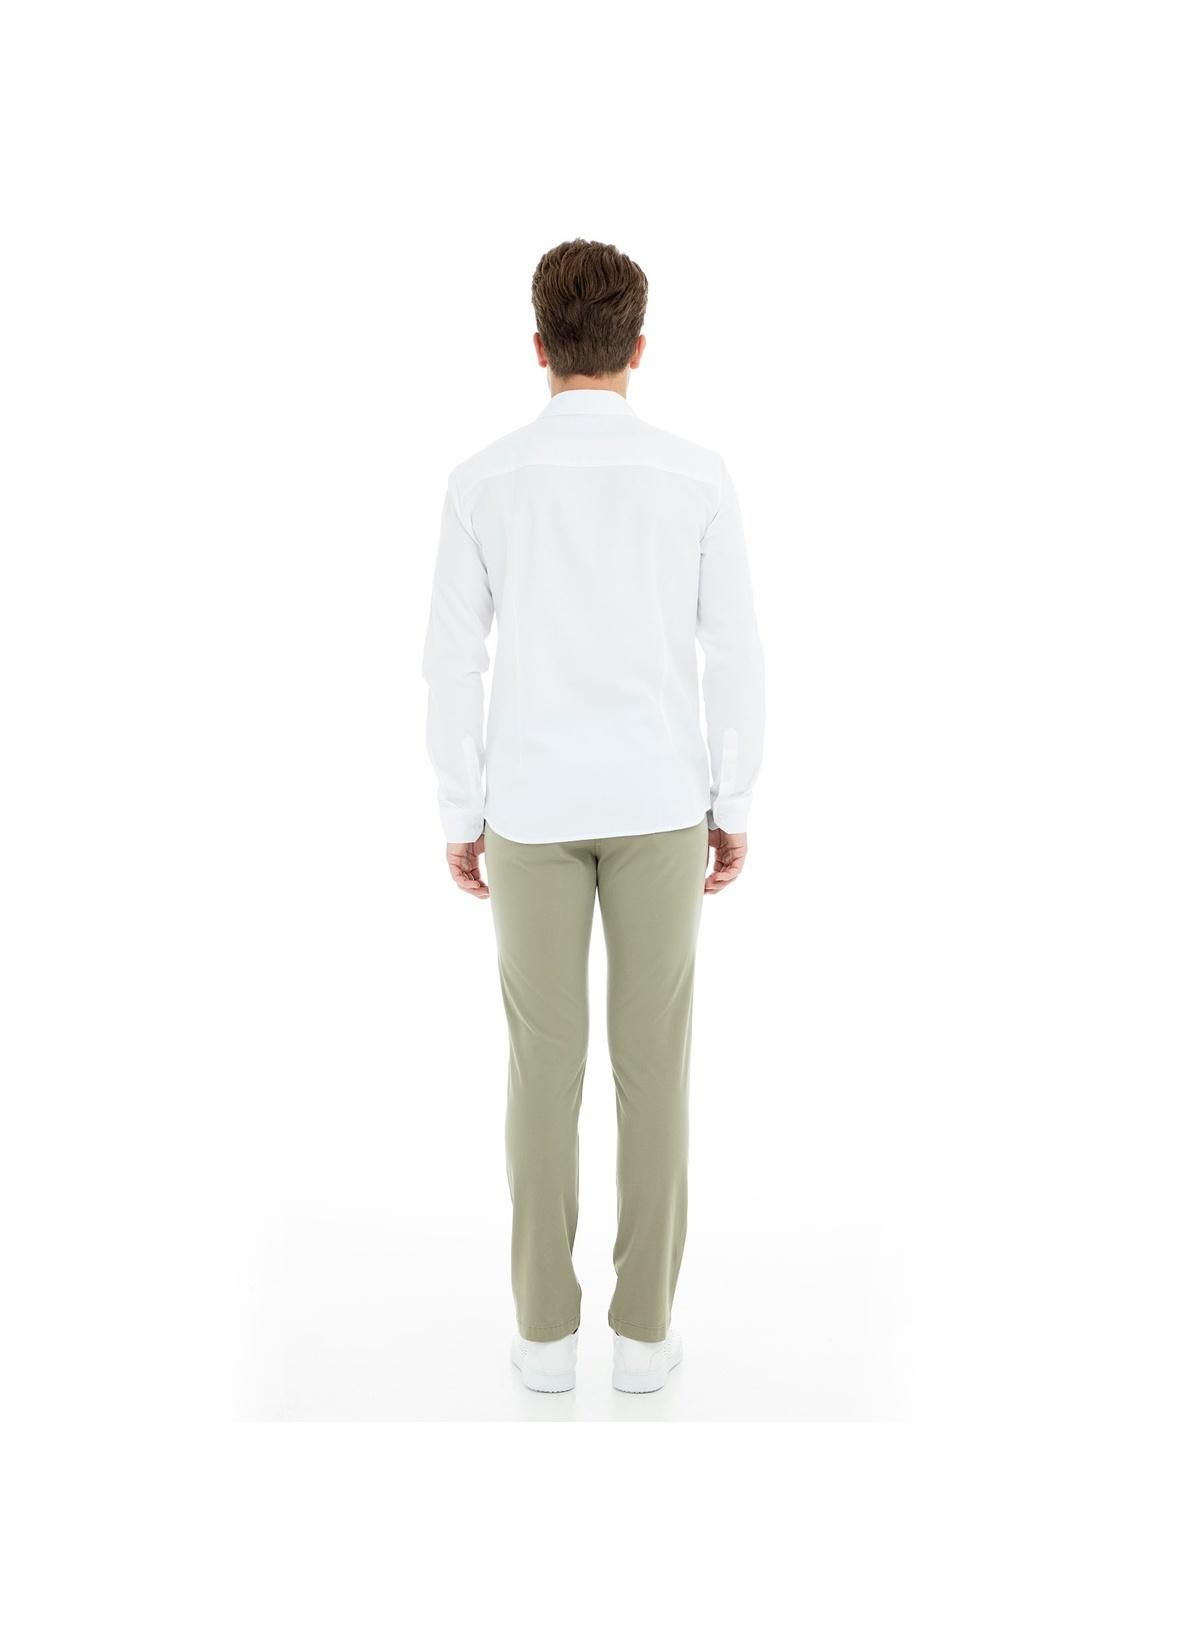 b0c2ccae35461 Dockers Erkek Pantolon Yeşil   Morhipo   23950795